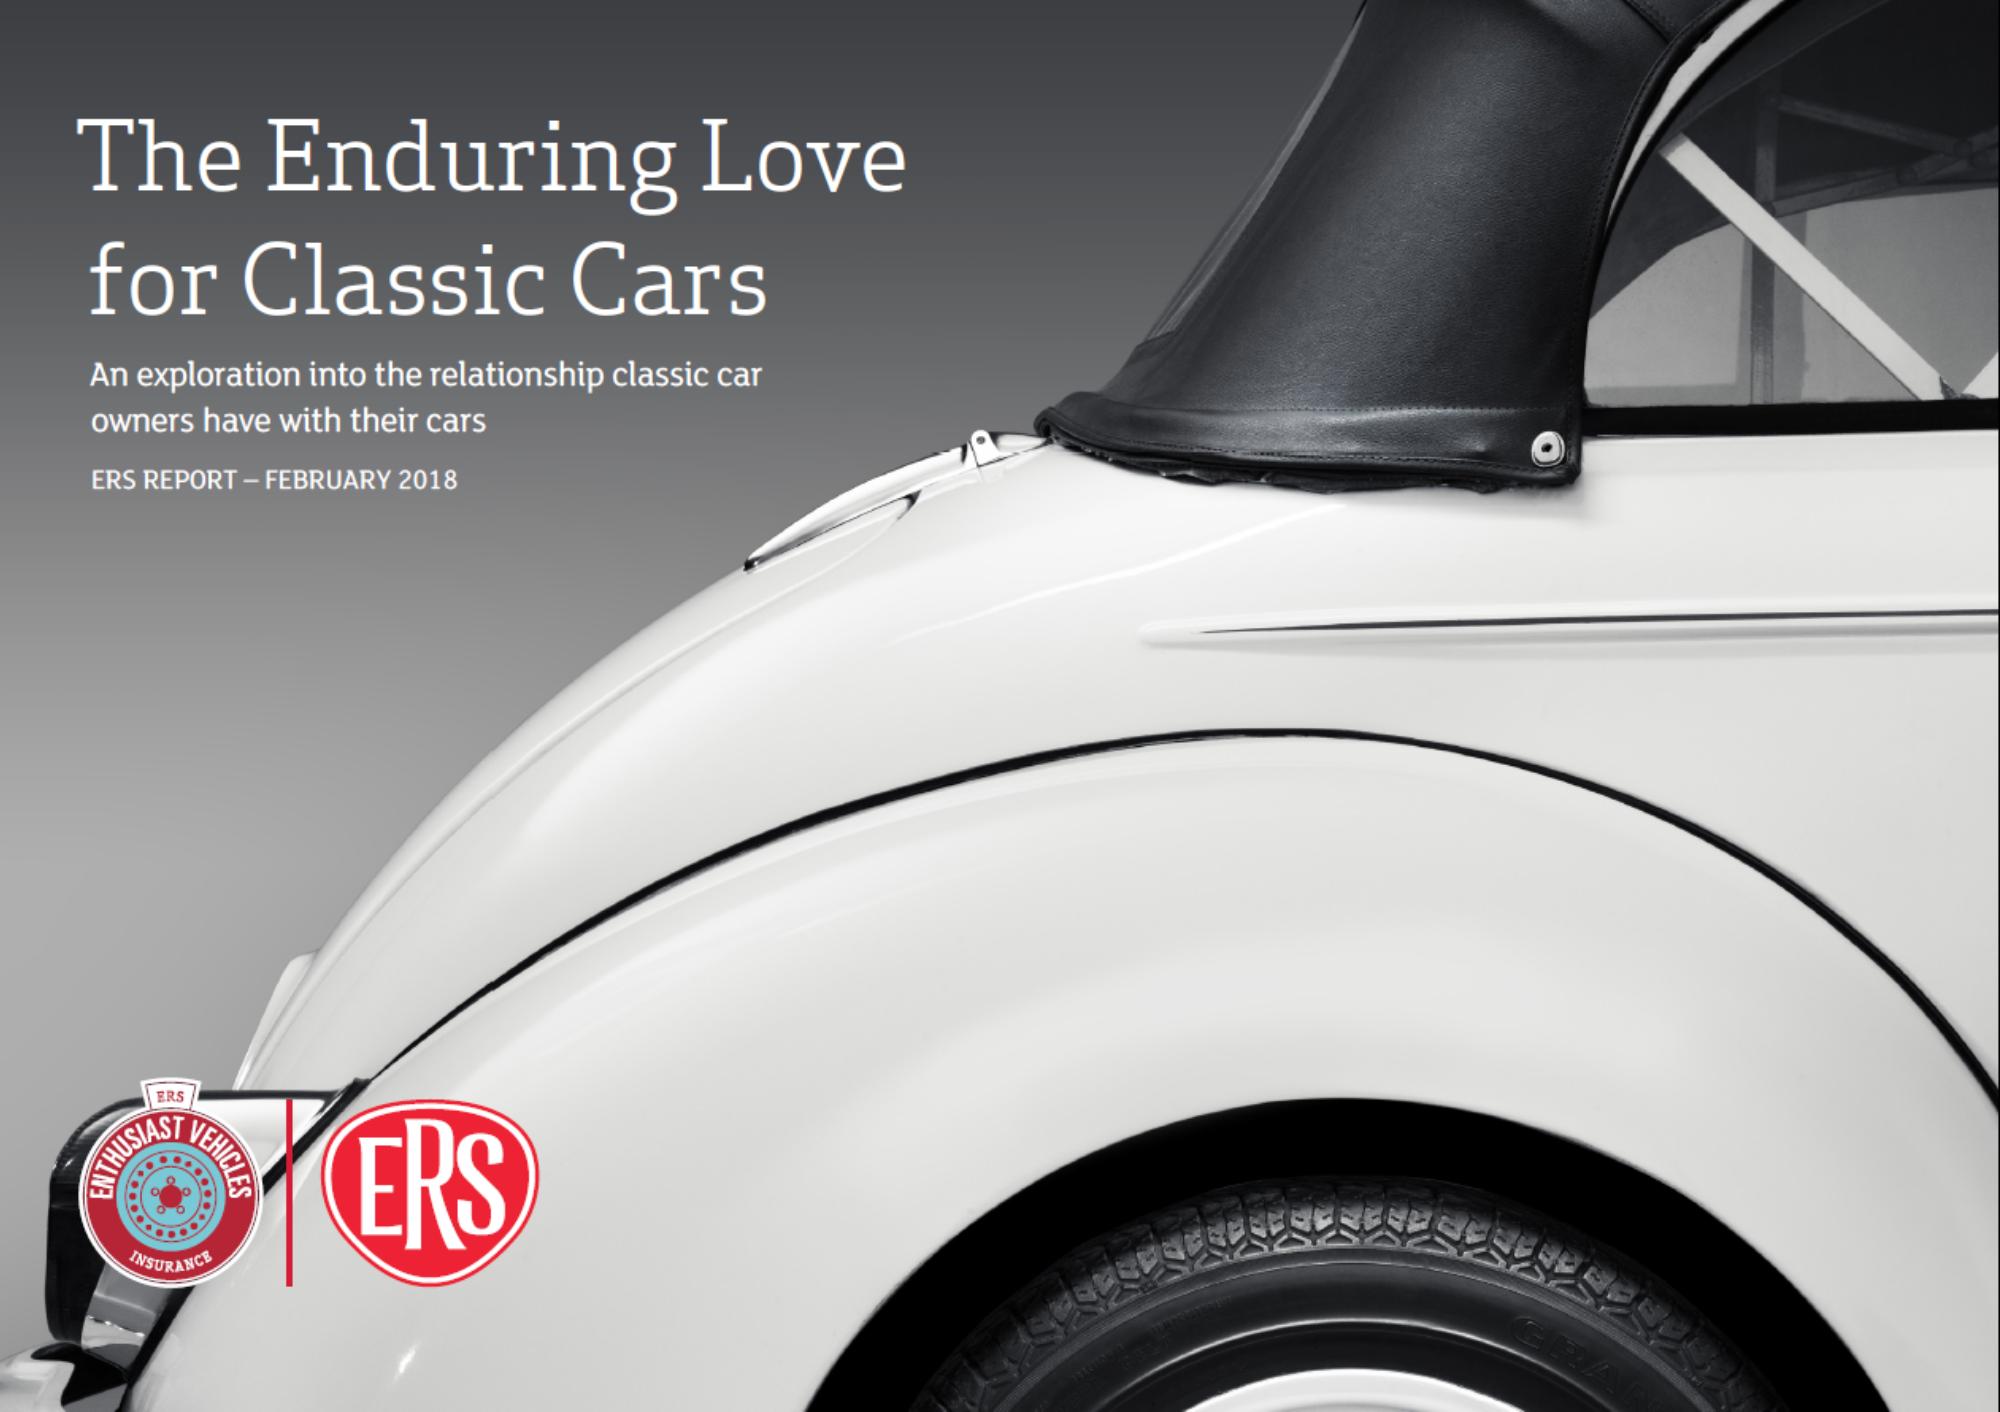 Classics still win the hearts on the dawn of autonomous cars